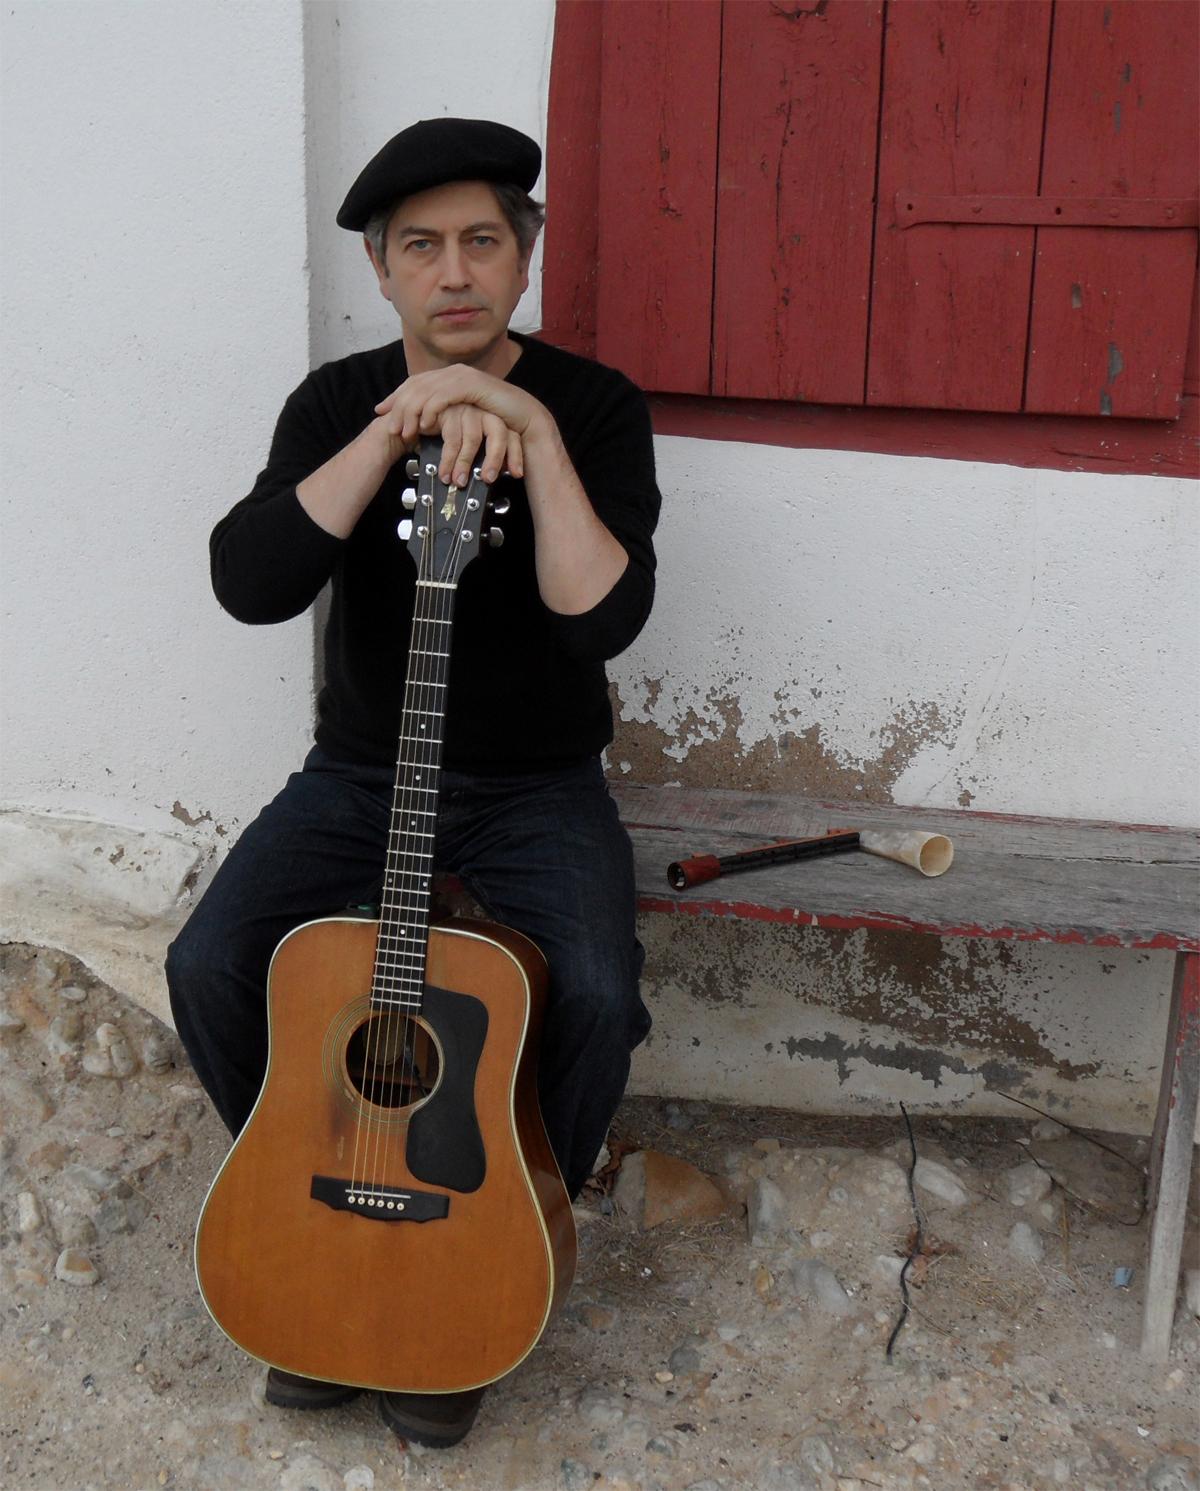 mixel-guitare-1461341363.jpg